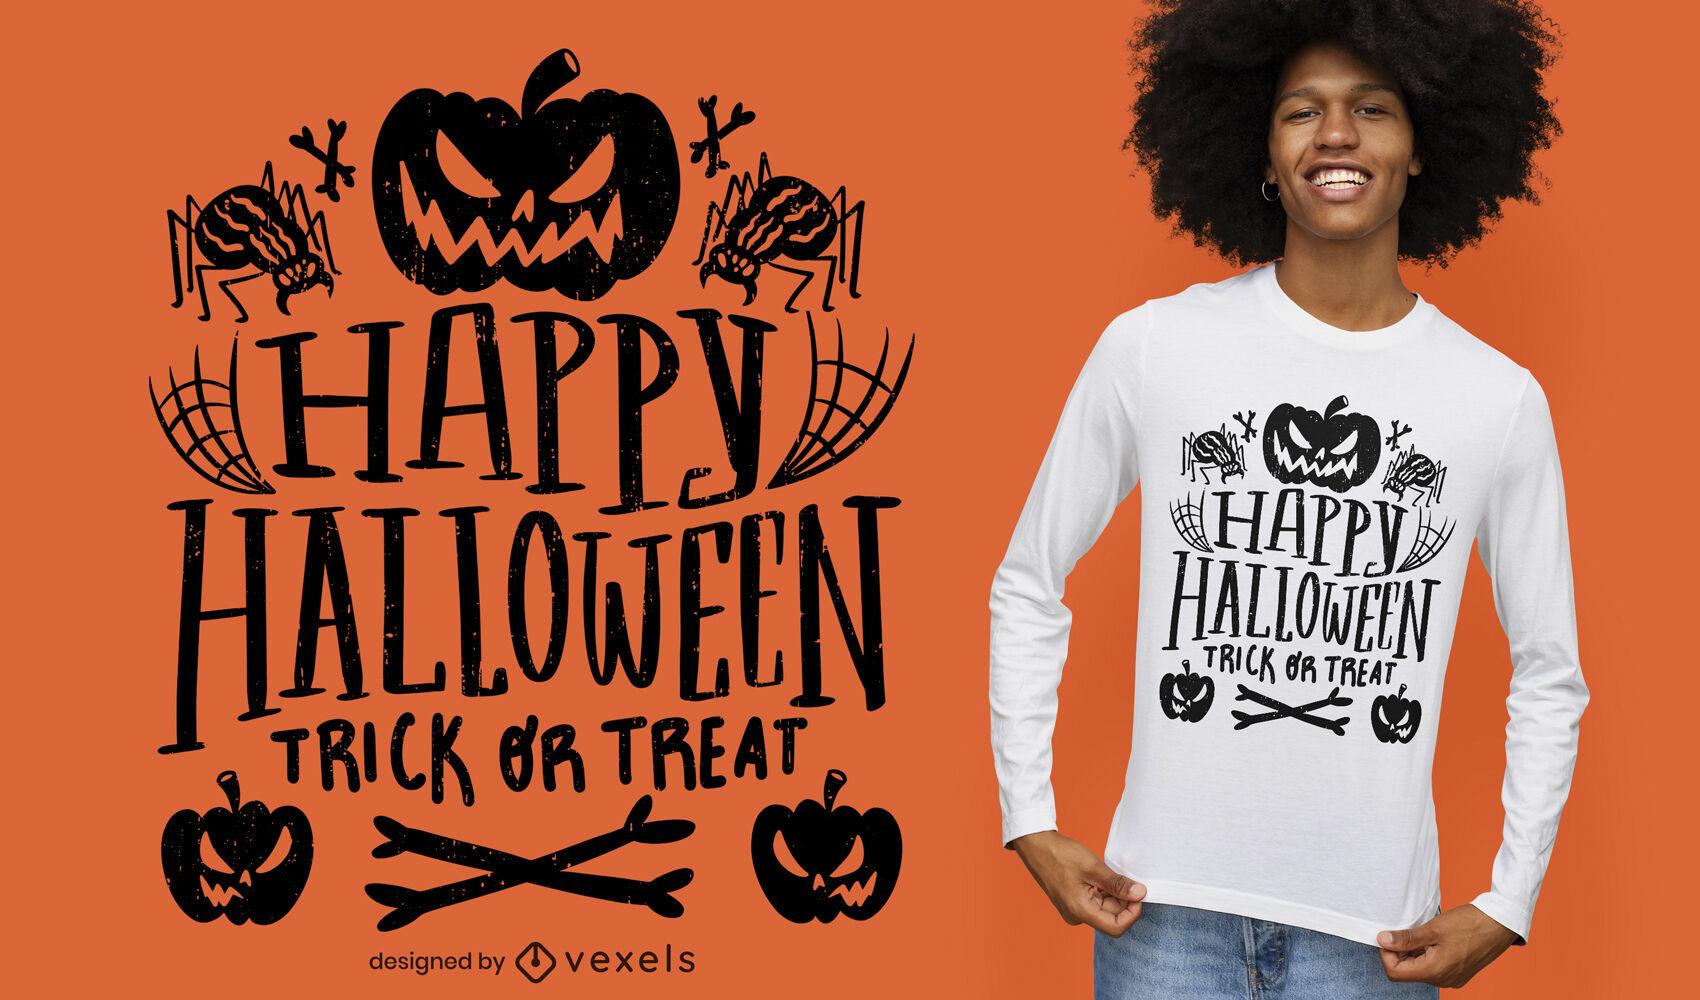 Happy halloween holiday t-shirt design